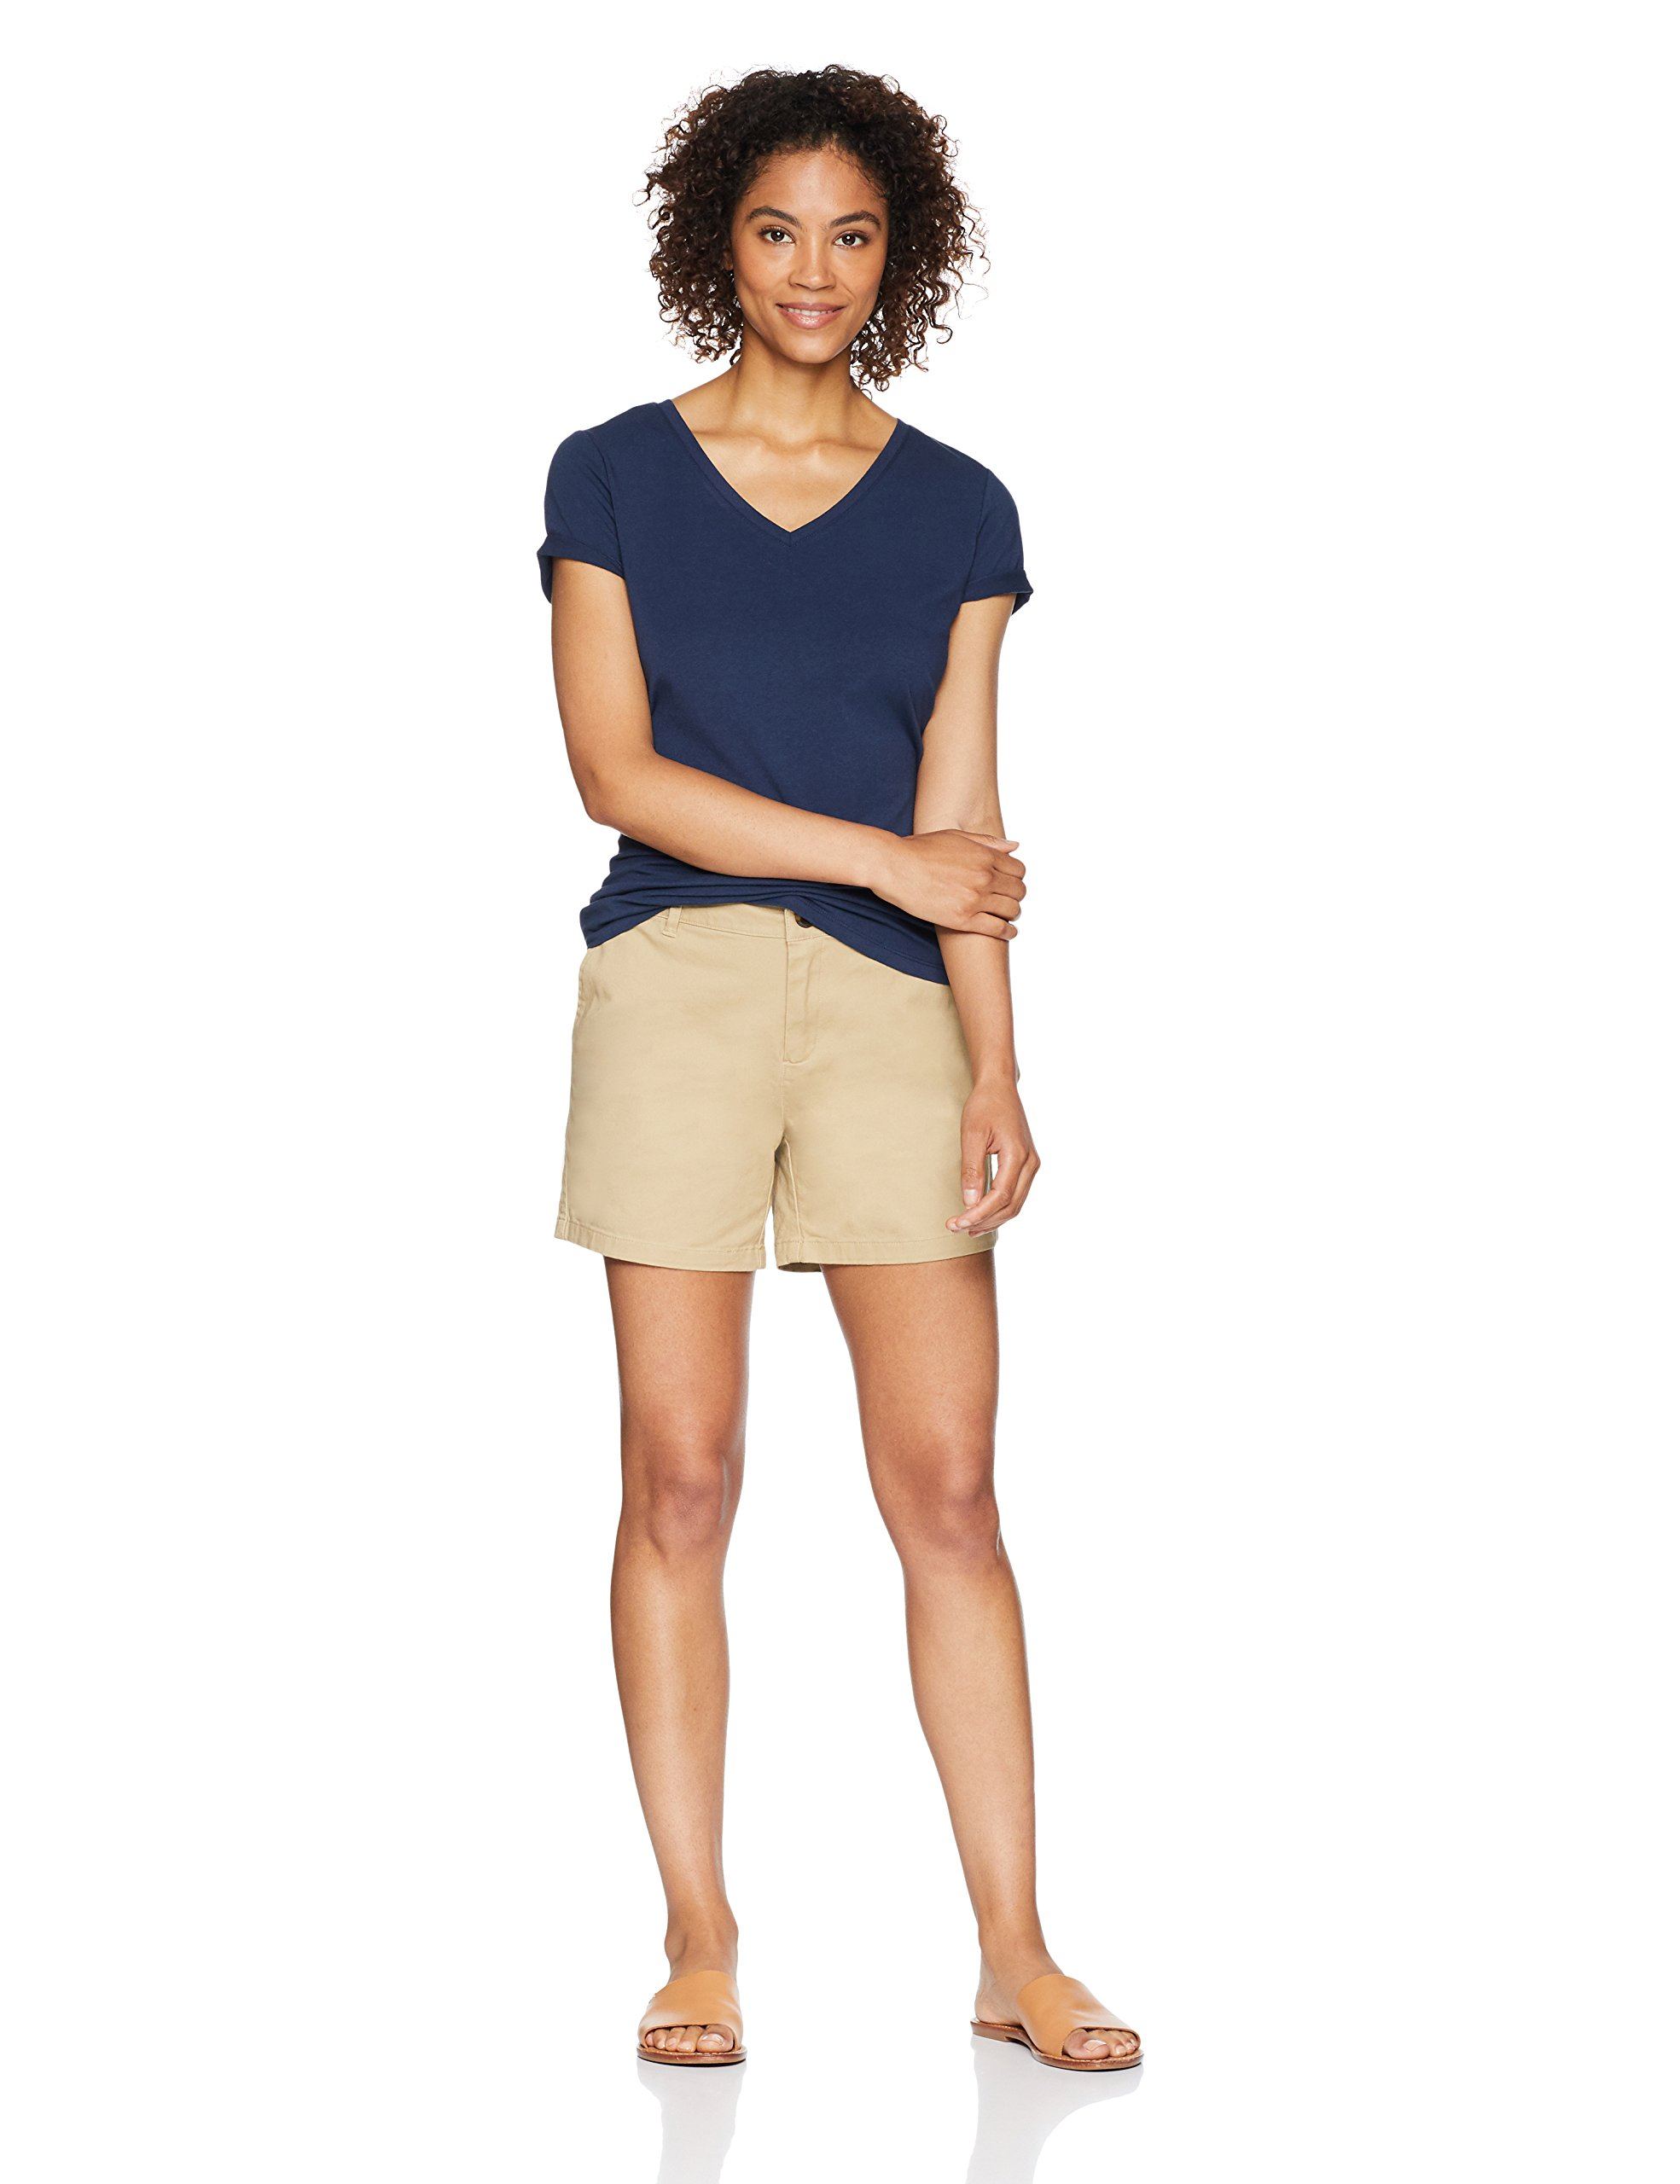 Amazon Essentials Women's 5'' Inseam Solid Chino Short Shorts, Khaki, 12 by Amazon Essentials (Image #2)